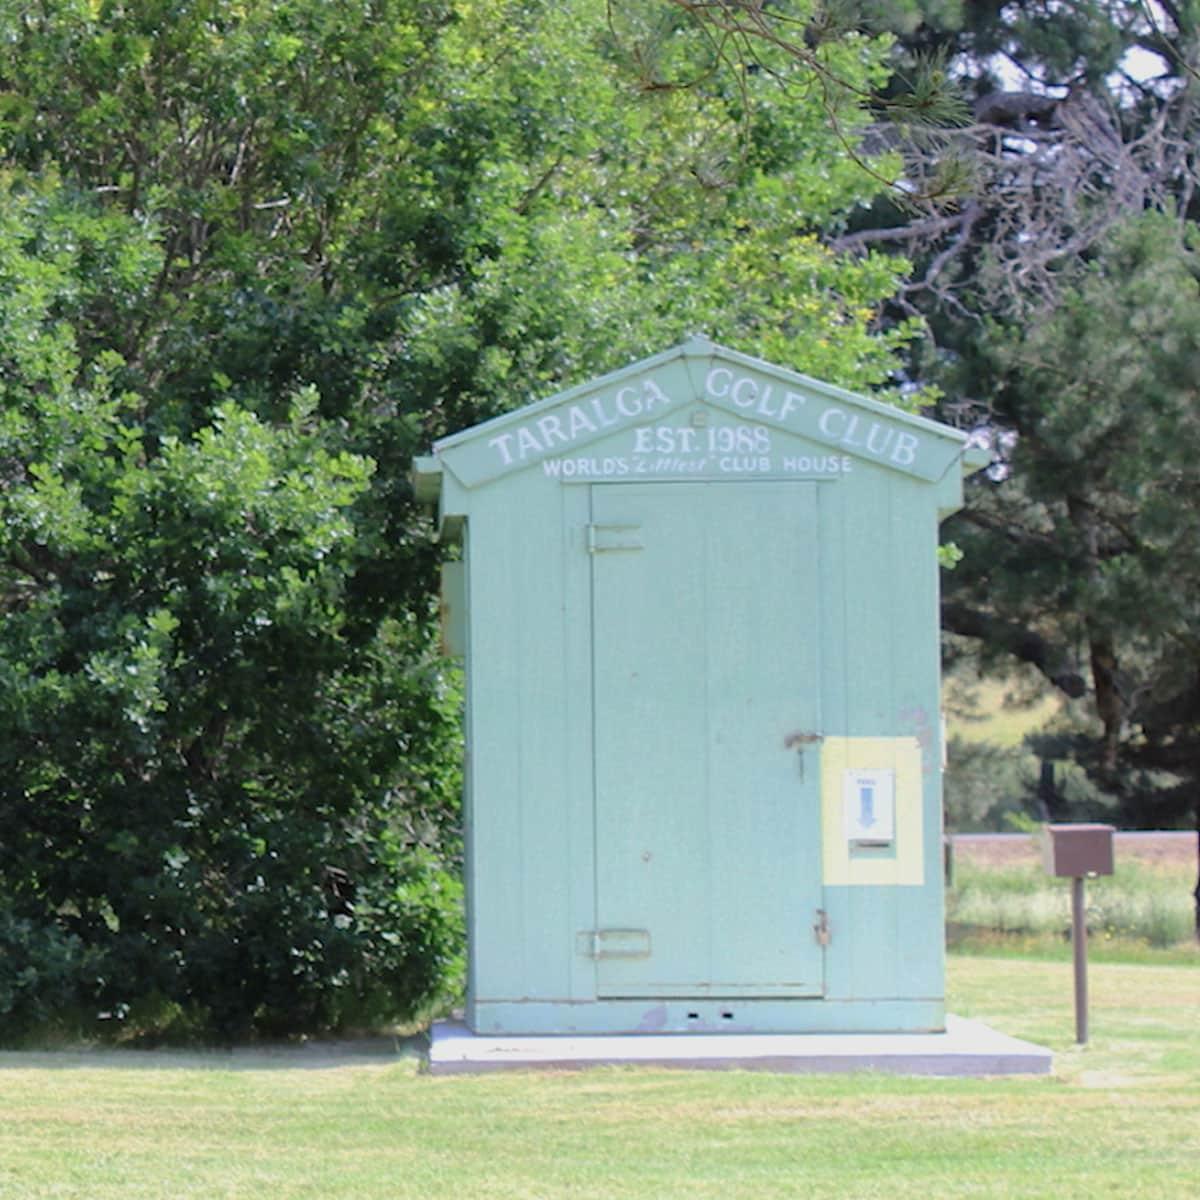 Taralga Golf Club - World's tiniest clubhouse